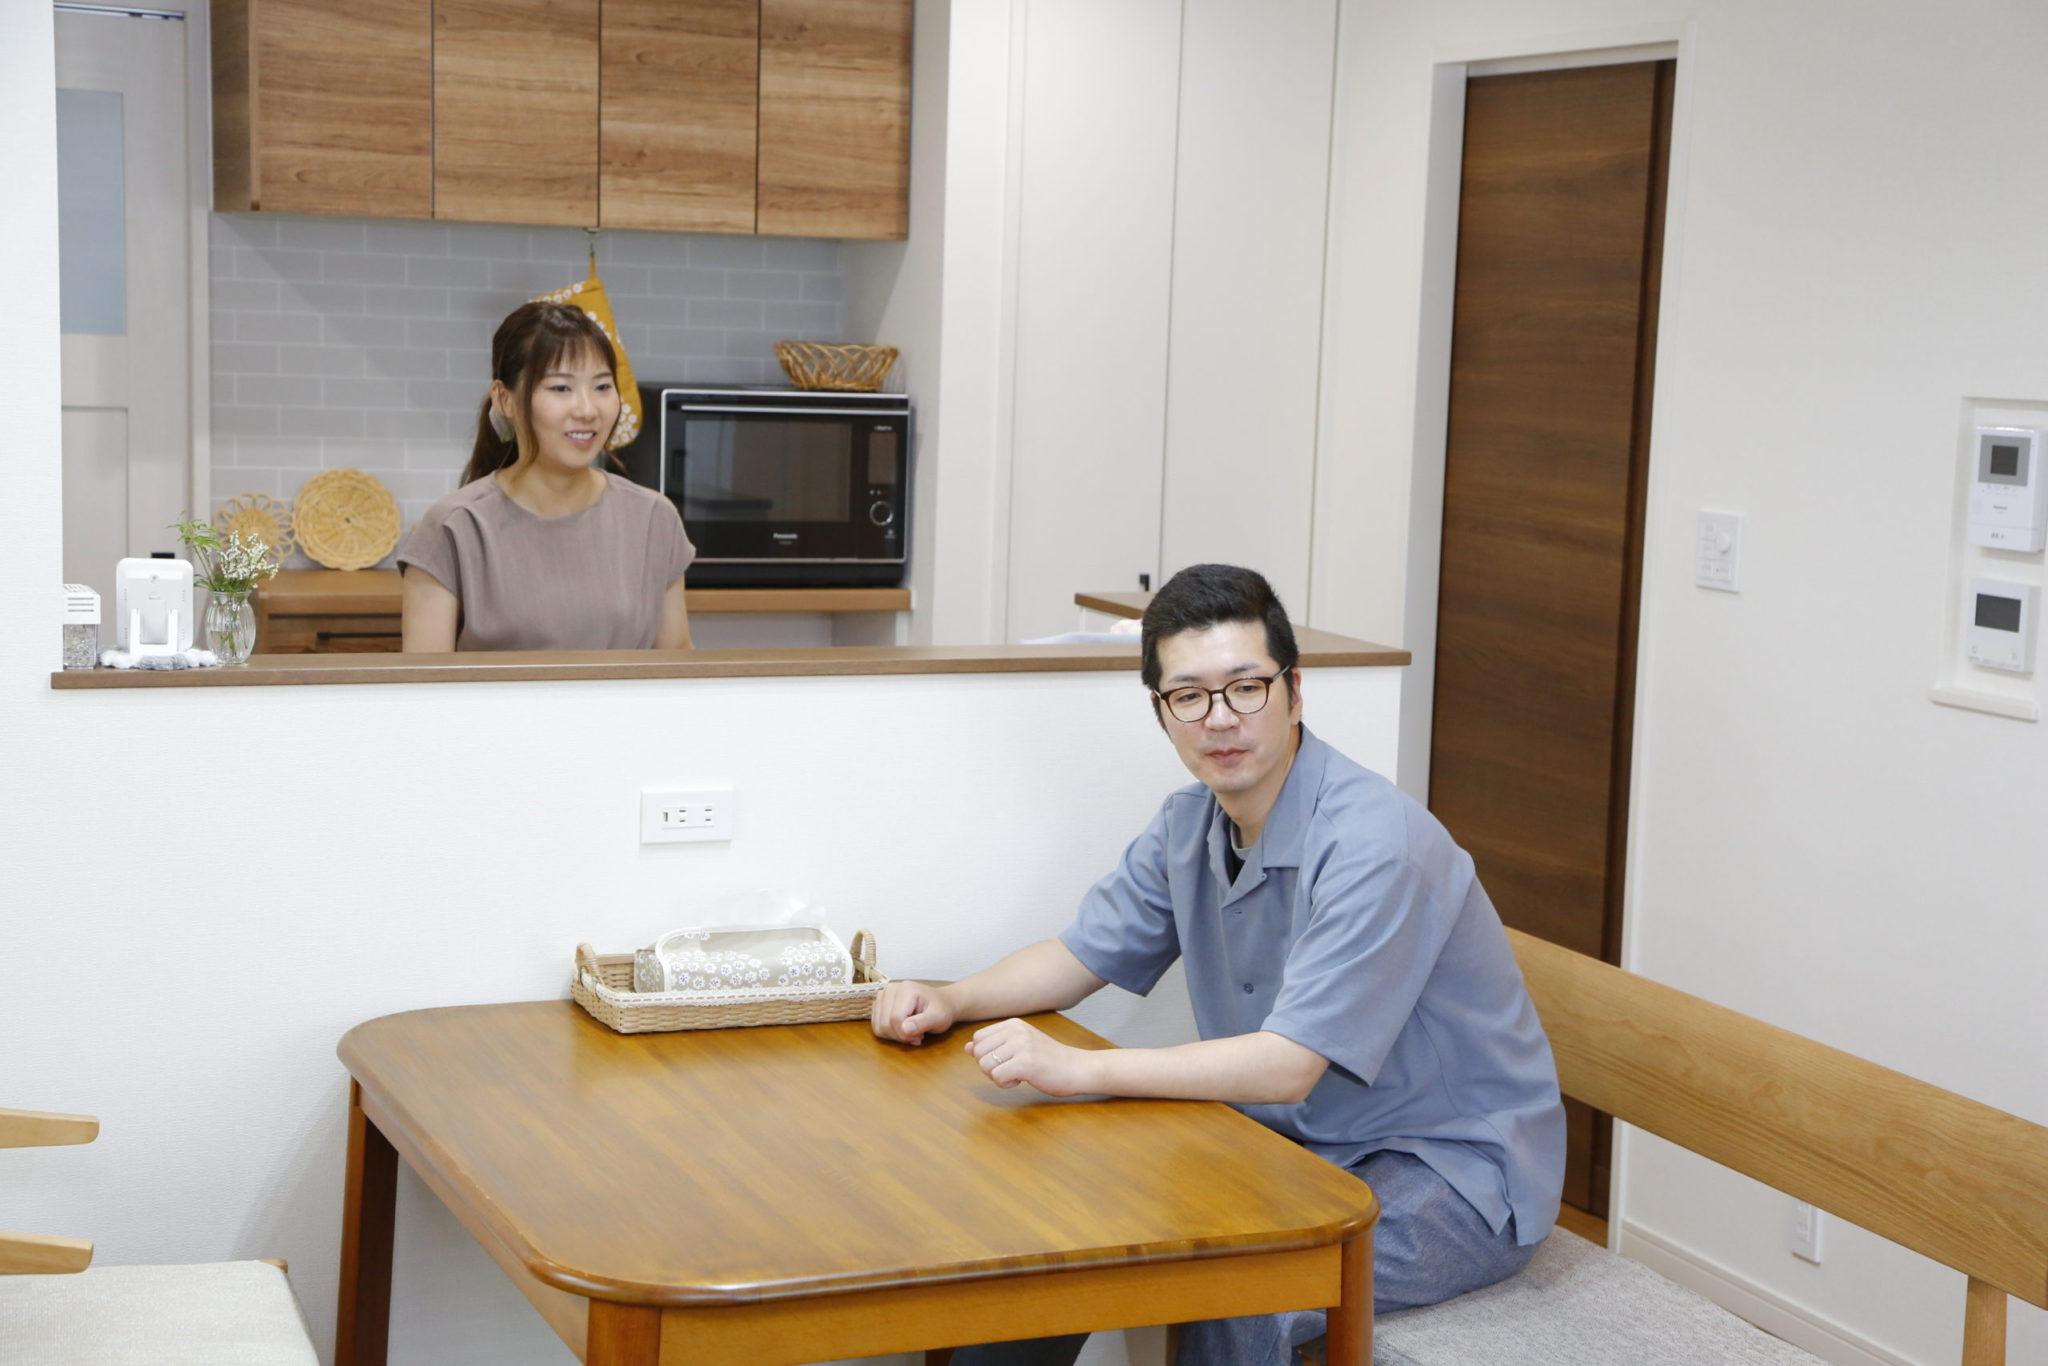 <p>勝美住宅に決めた理由を教えて下さい。</p>